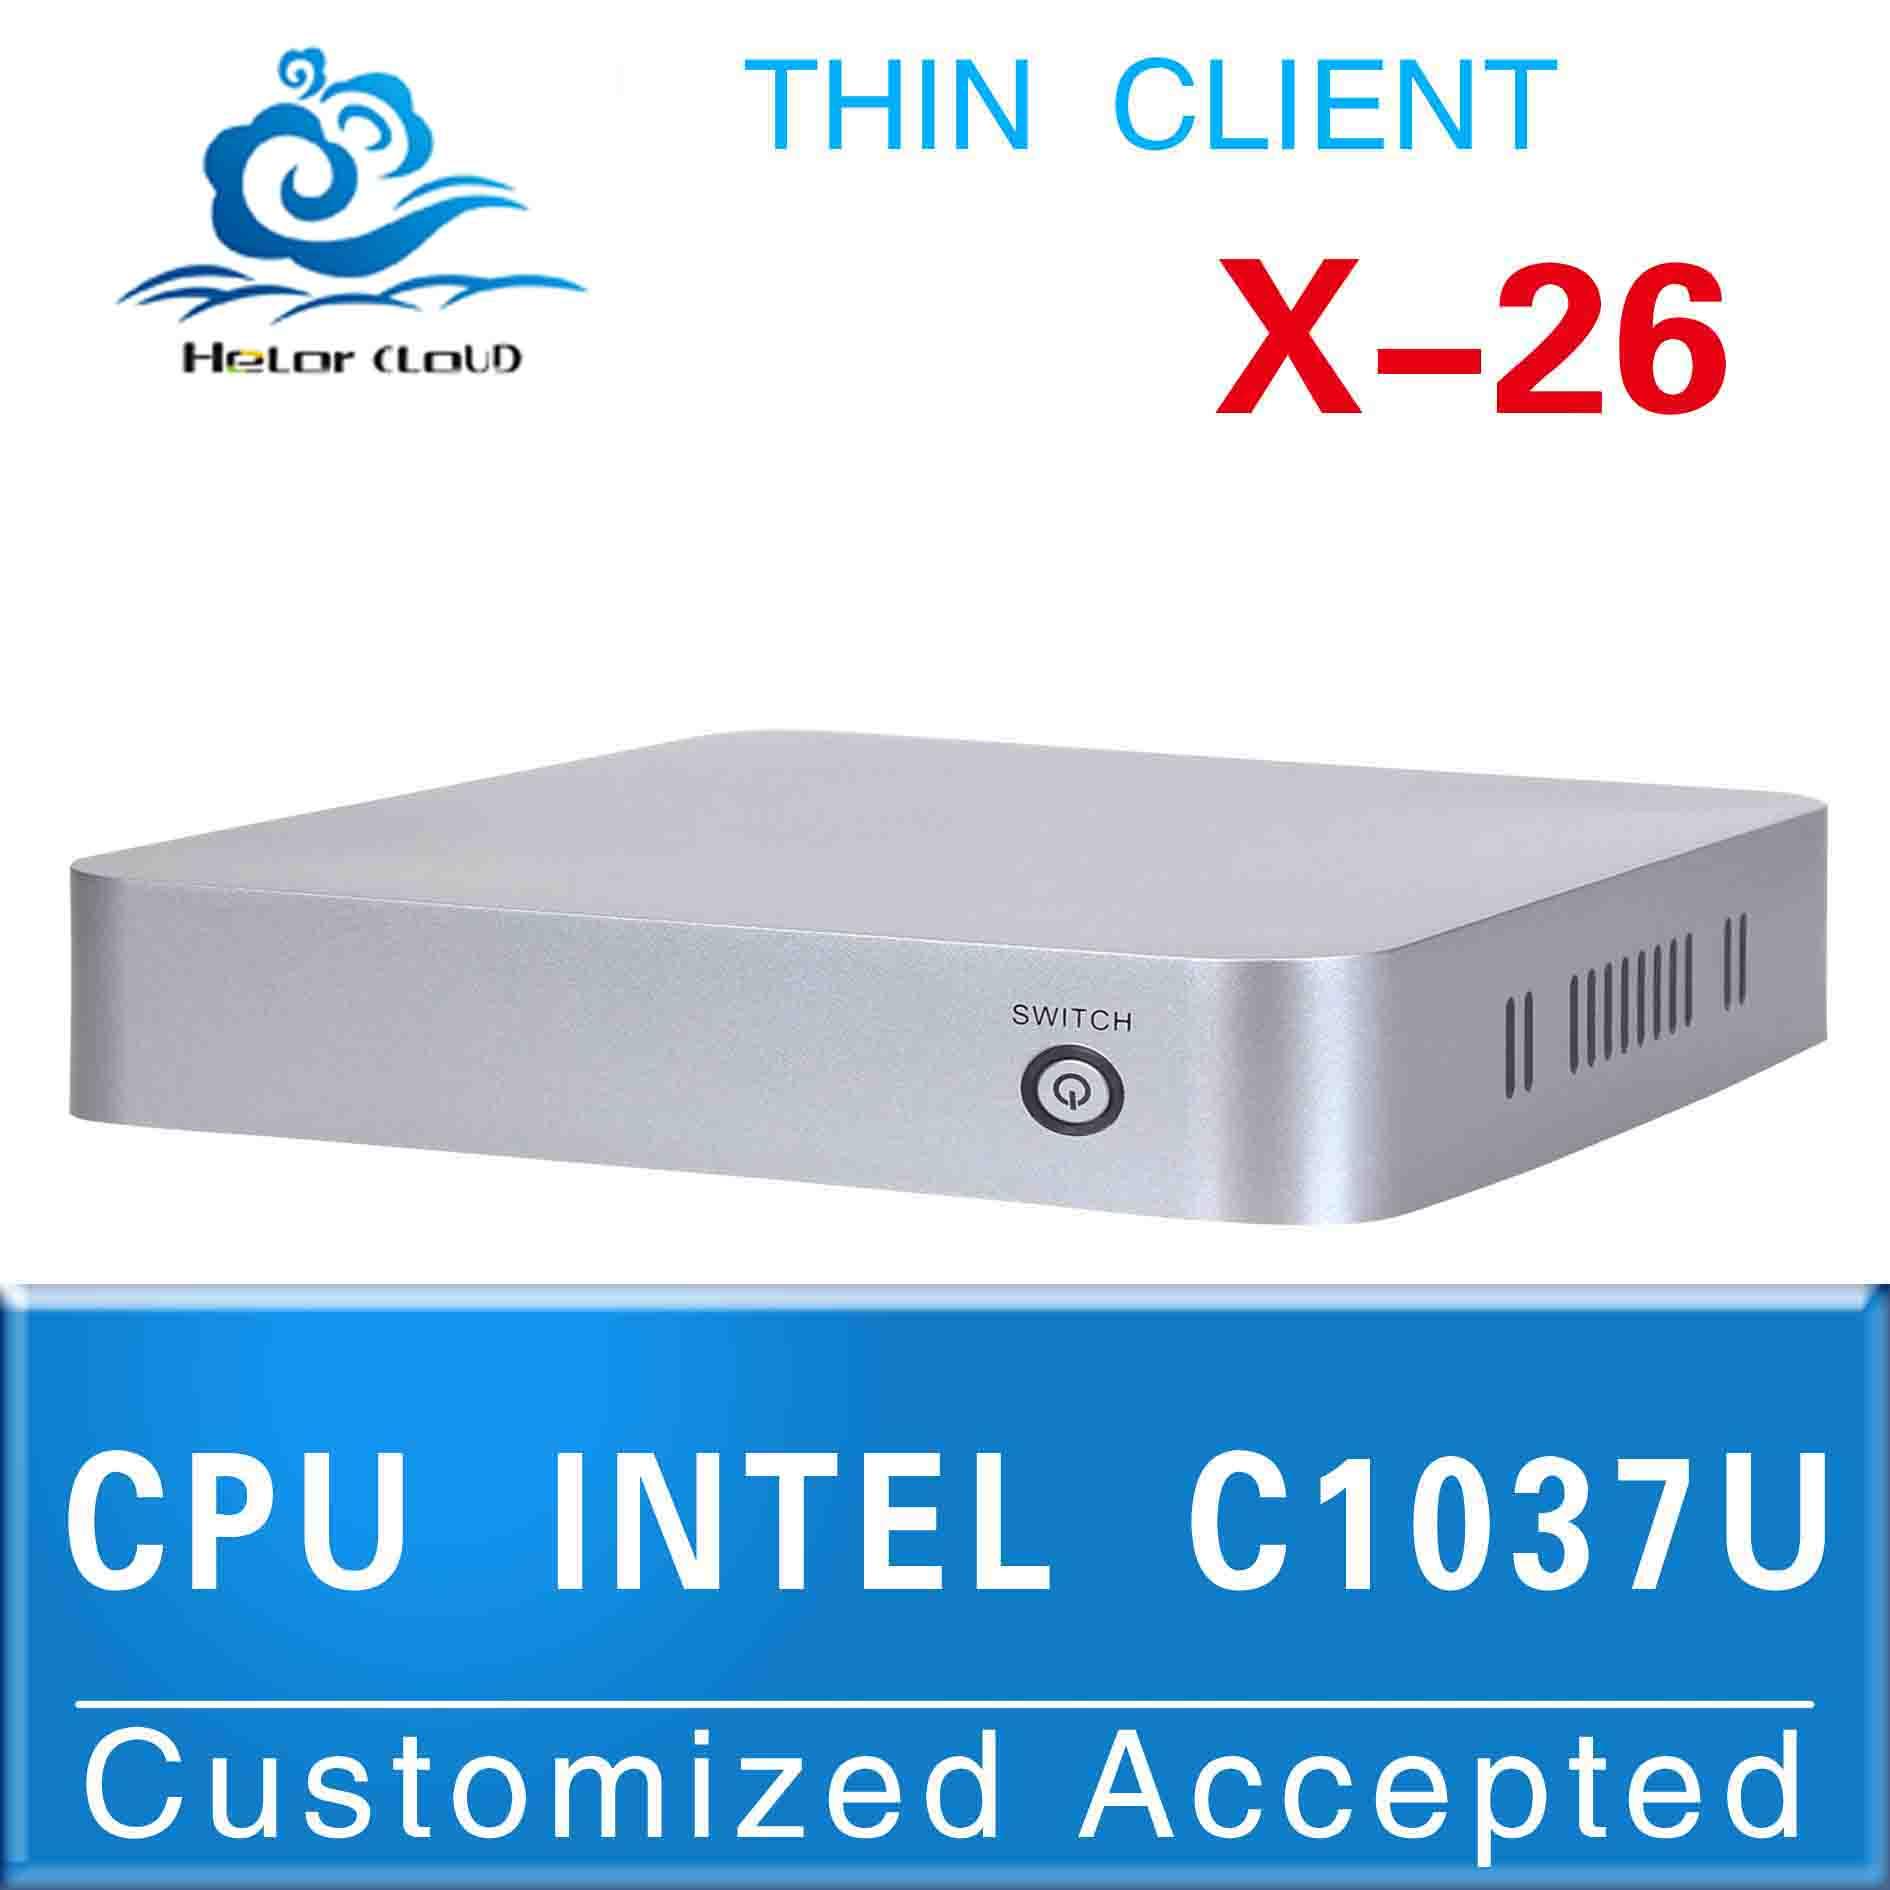 fan mini itx motherboard Multi computing linux mini pc vga C1037U X26 computer intel Celeron Dual barebone os(China (Mainland))